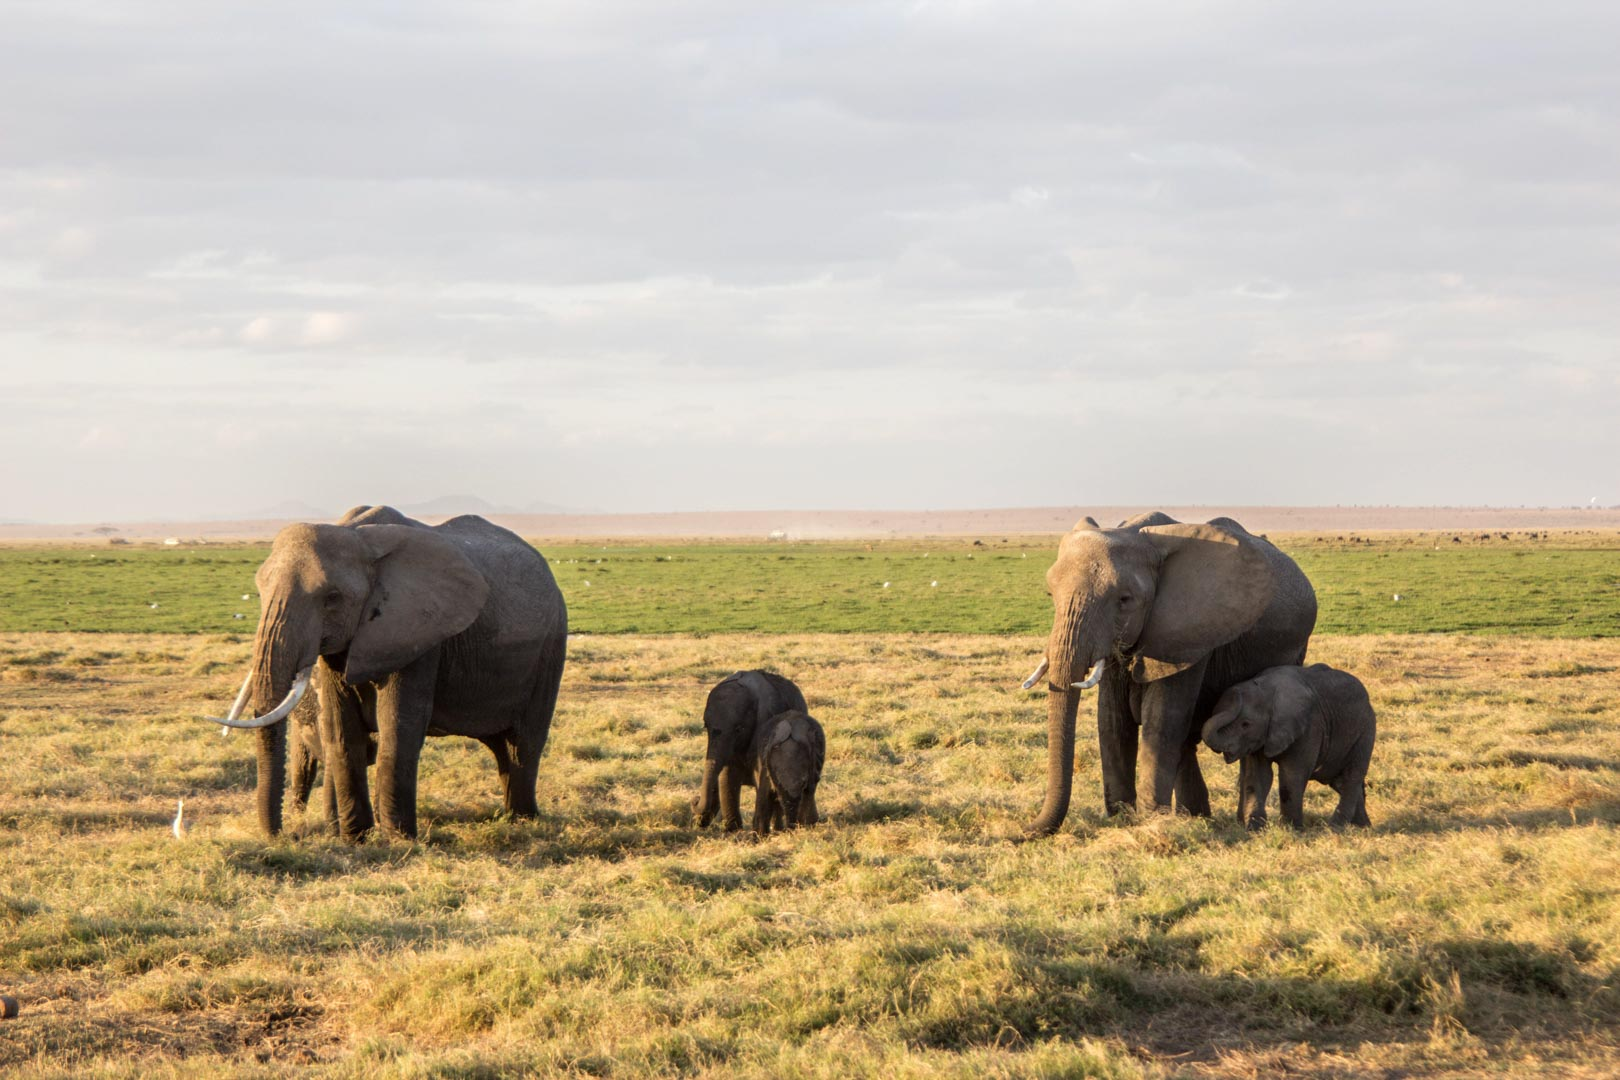 Manada de elefantes, Parque Nacional de Amboseli, Kenia